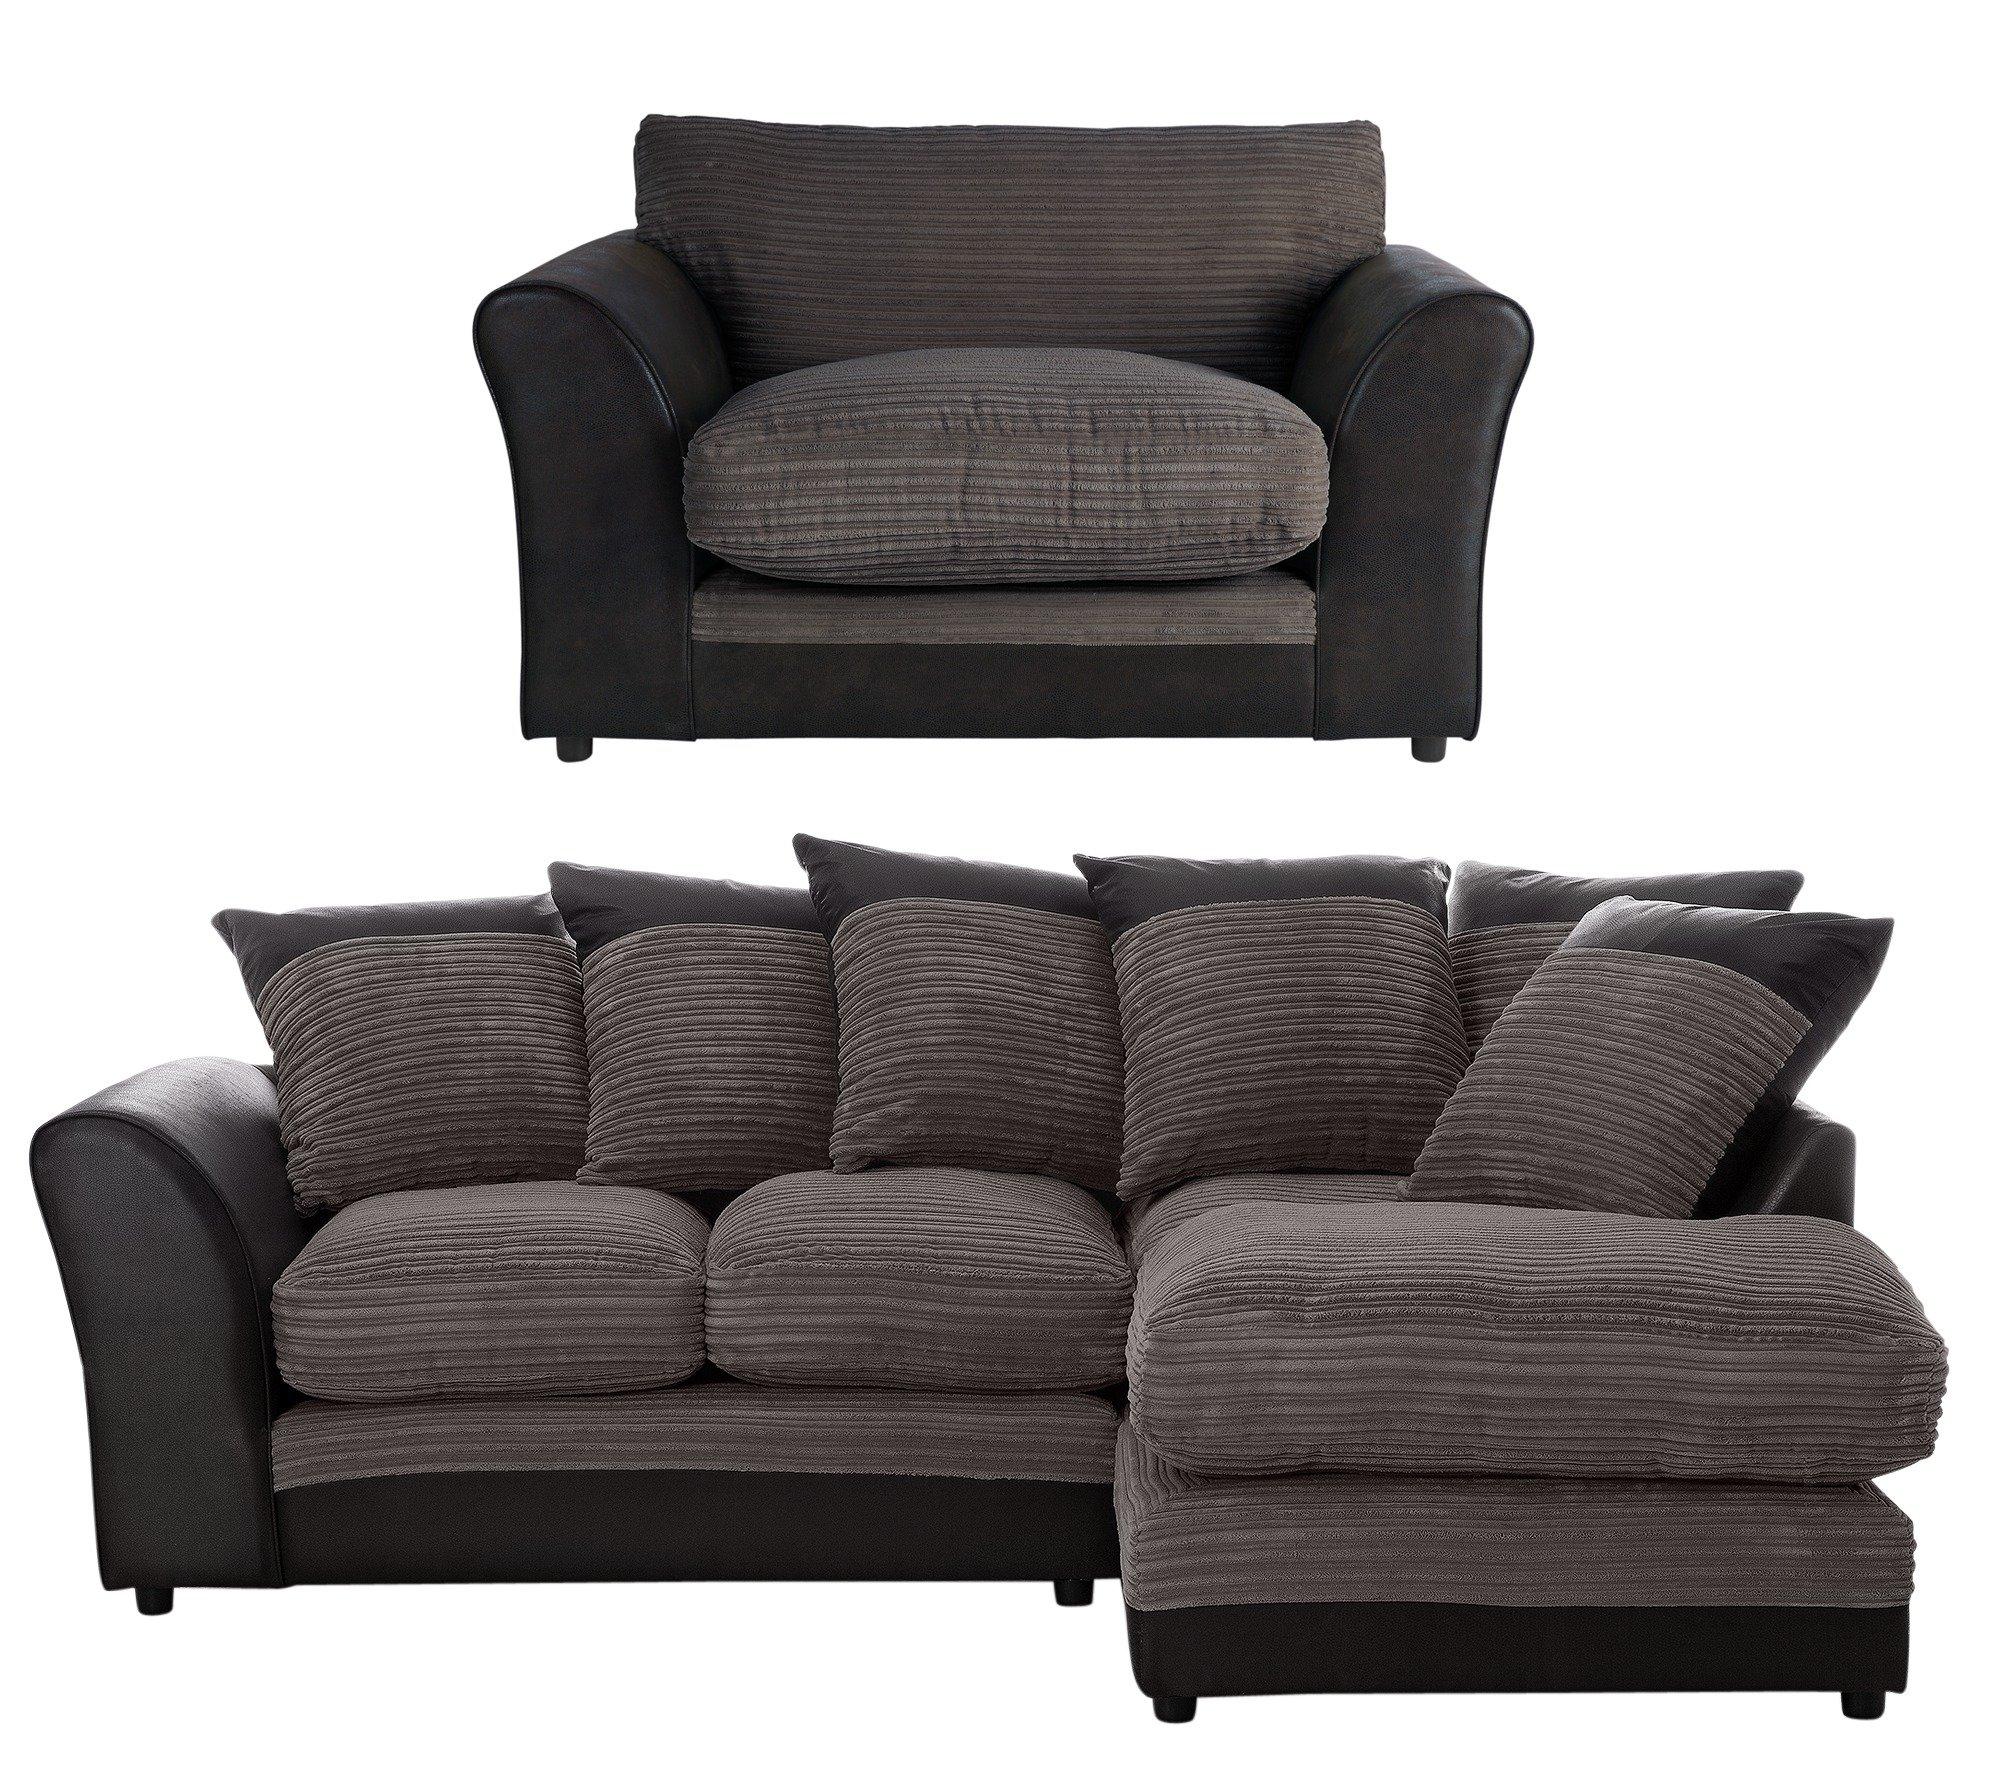 Argos Home Harley Reg RH Corner Charcoal Sofa & Cuddle Chair